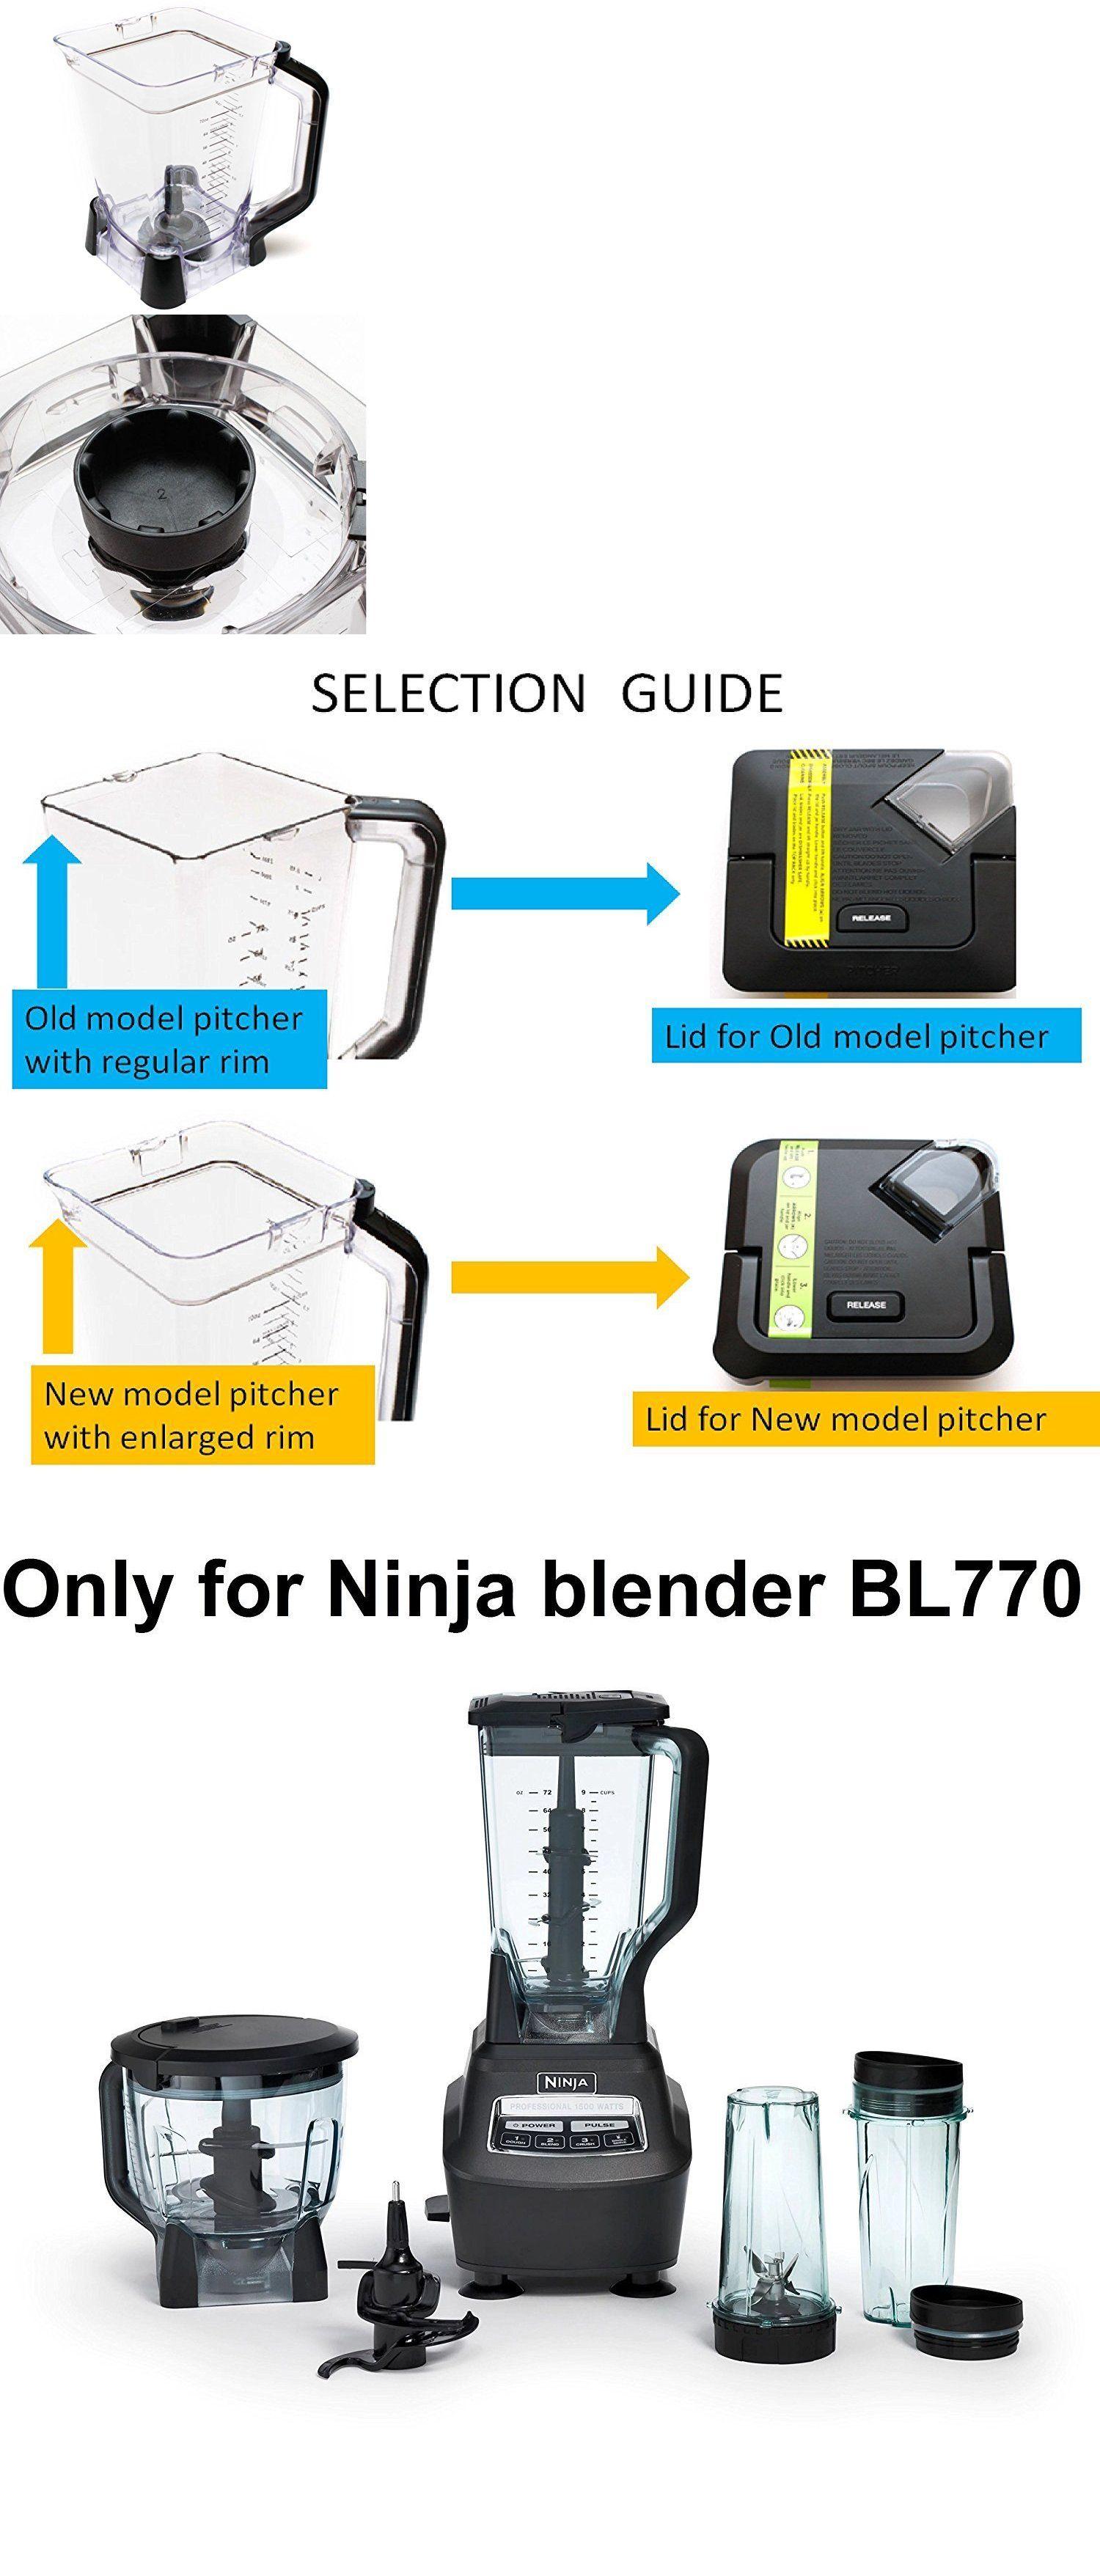 Countertop Blenders 133704: Ninja Mega Kitchen System Bl770 ...